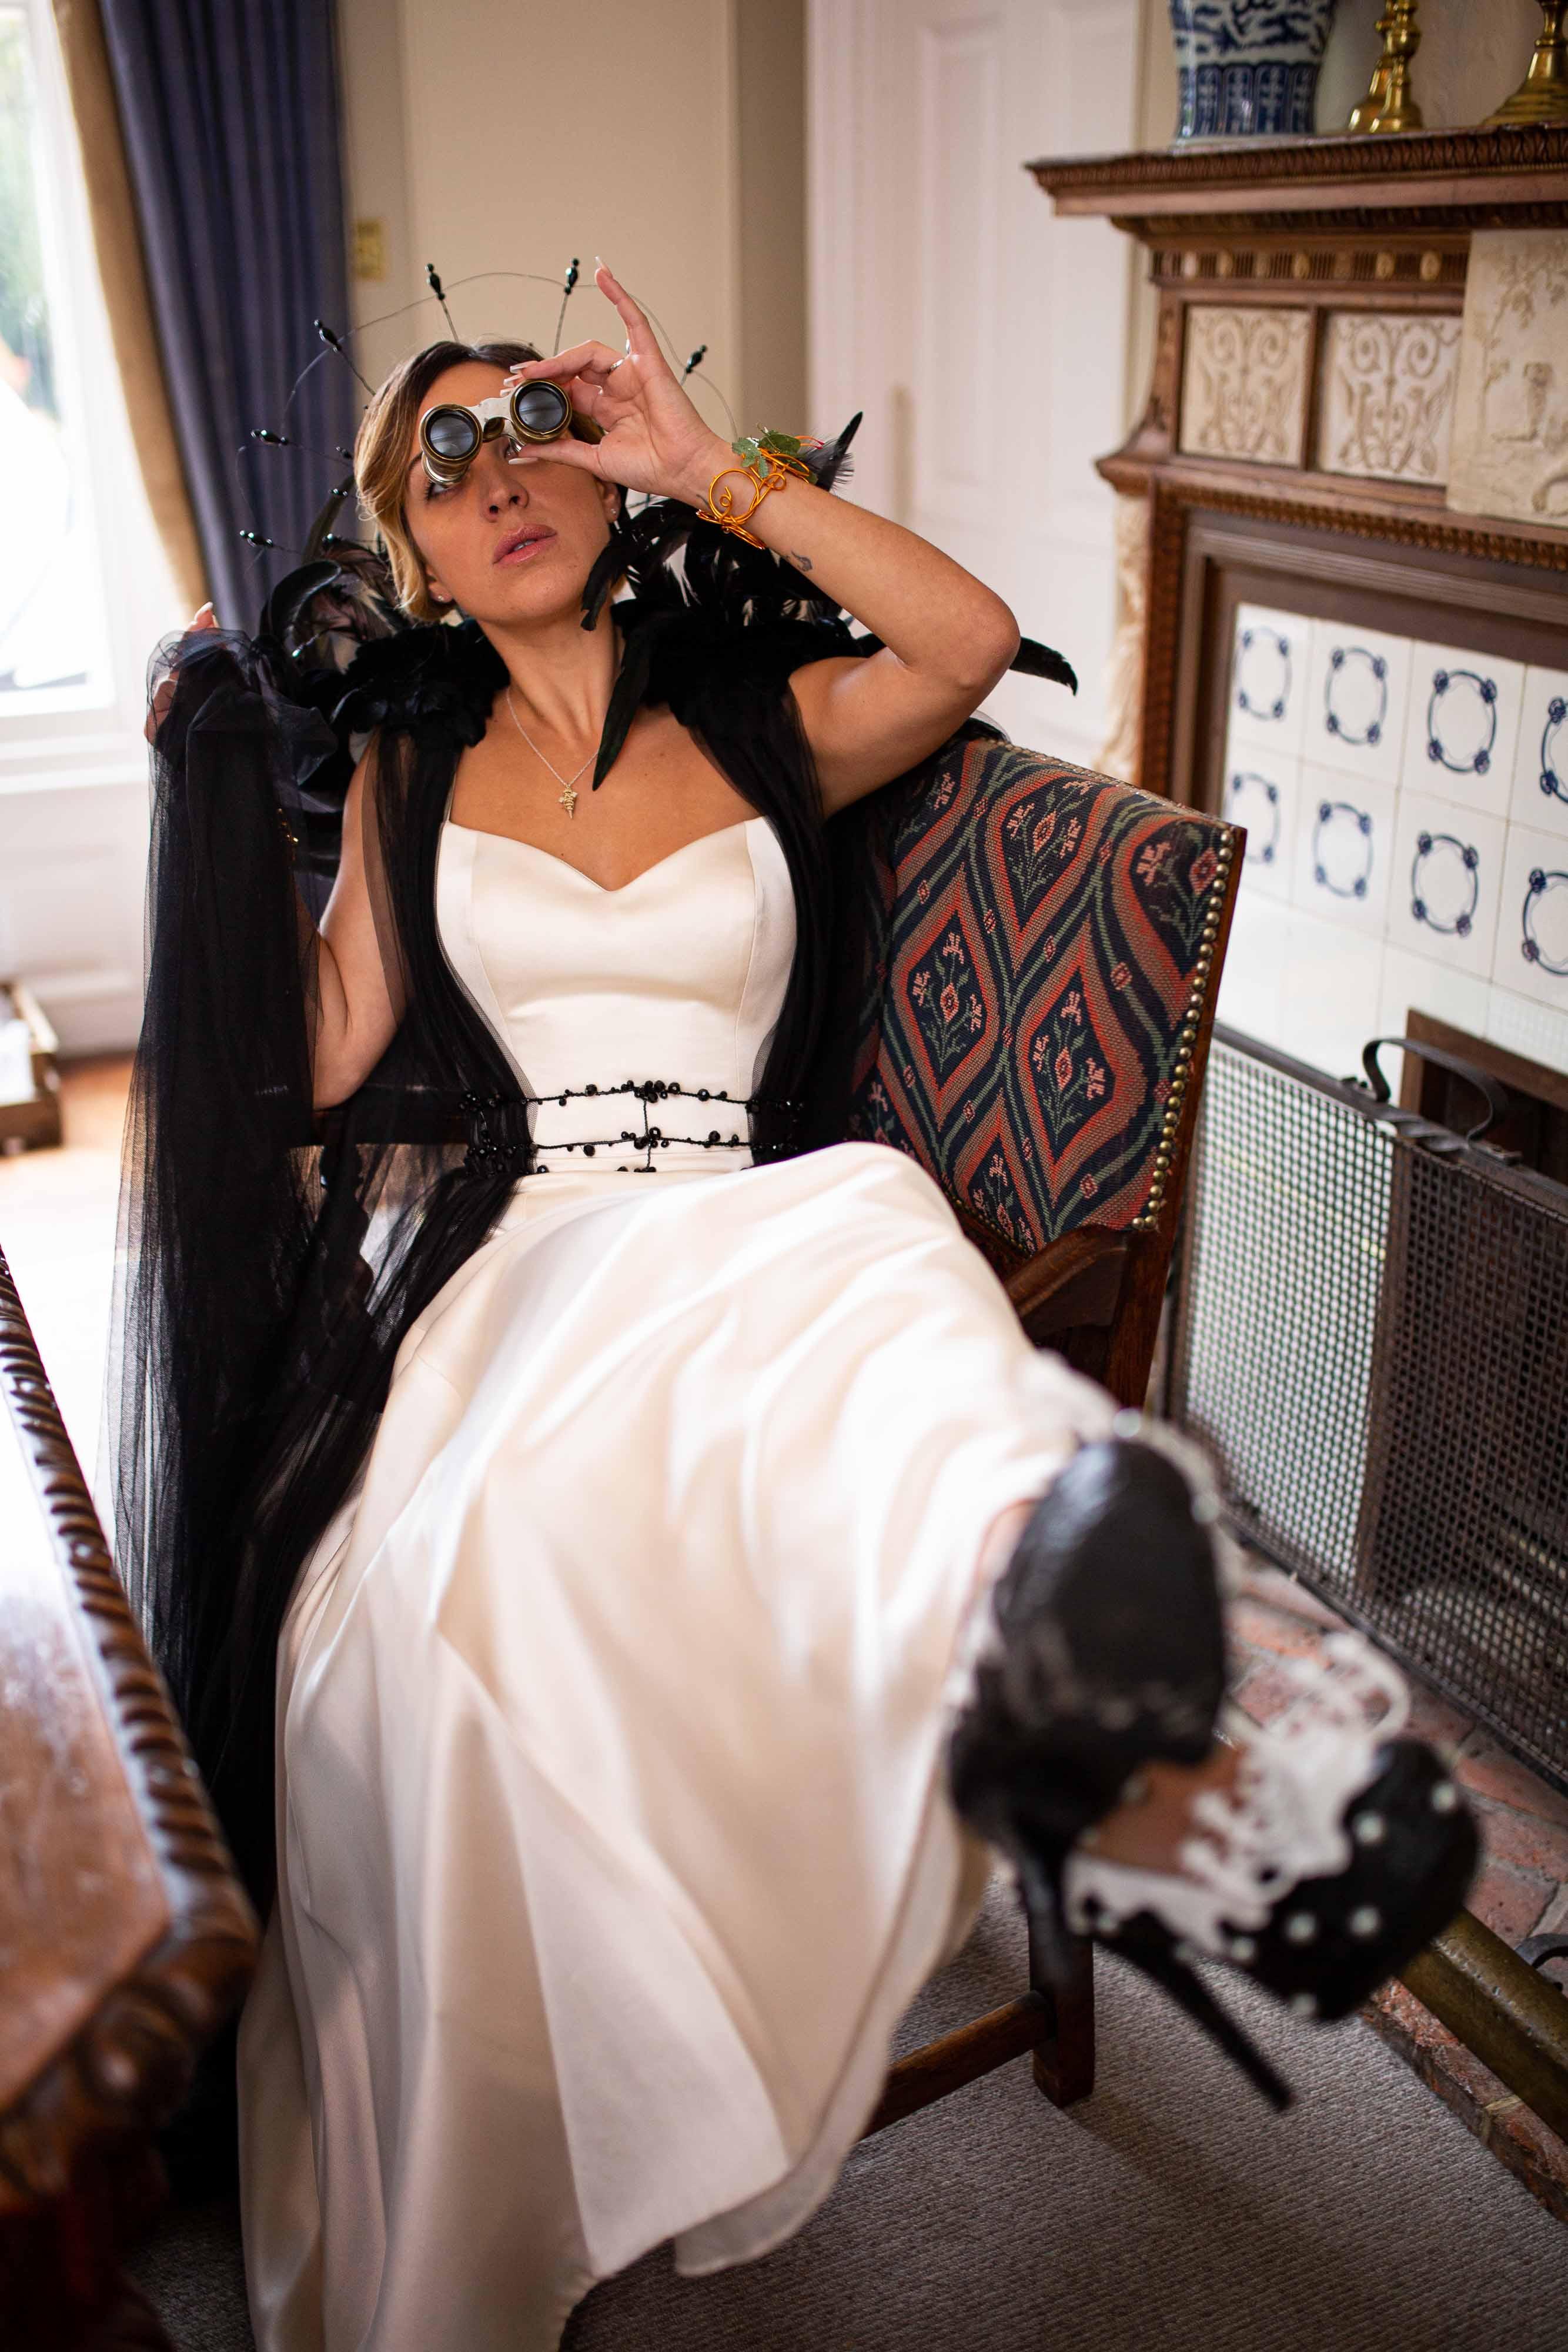 iconic wedding looks- music themed wedding- unconventional wedding- alternative wedding- eclectic wedding dress-alternative wedding dress- unique wedding dress- creative wedding- lady gaga wedding look